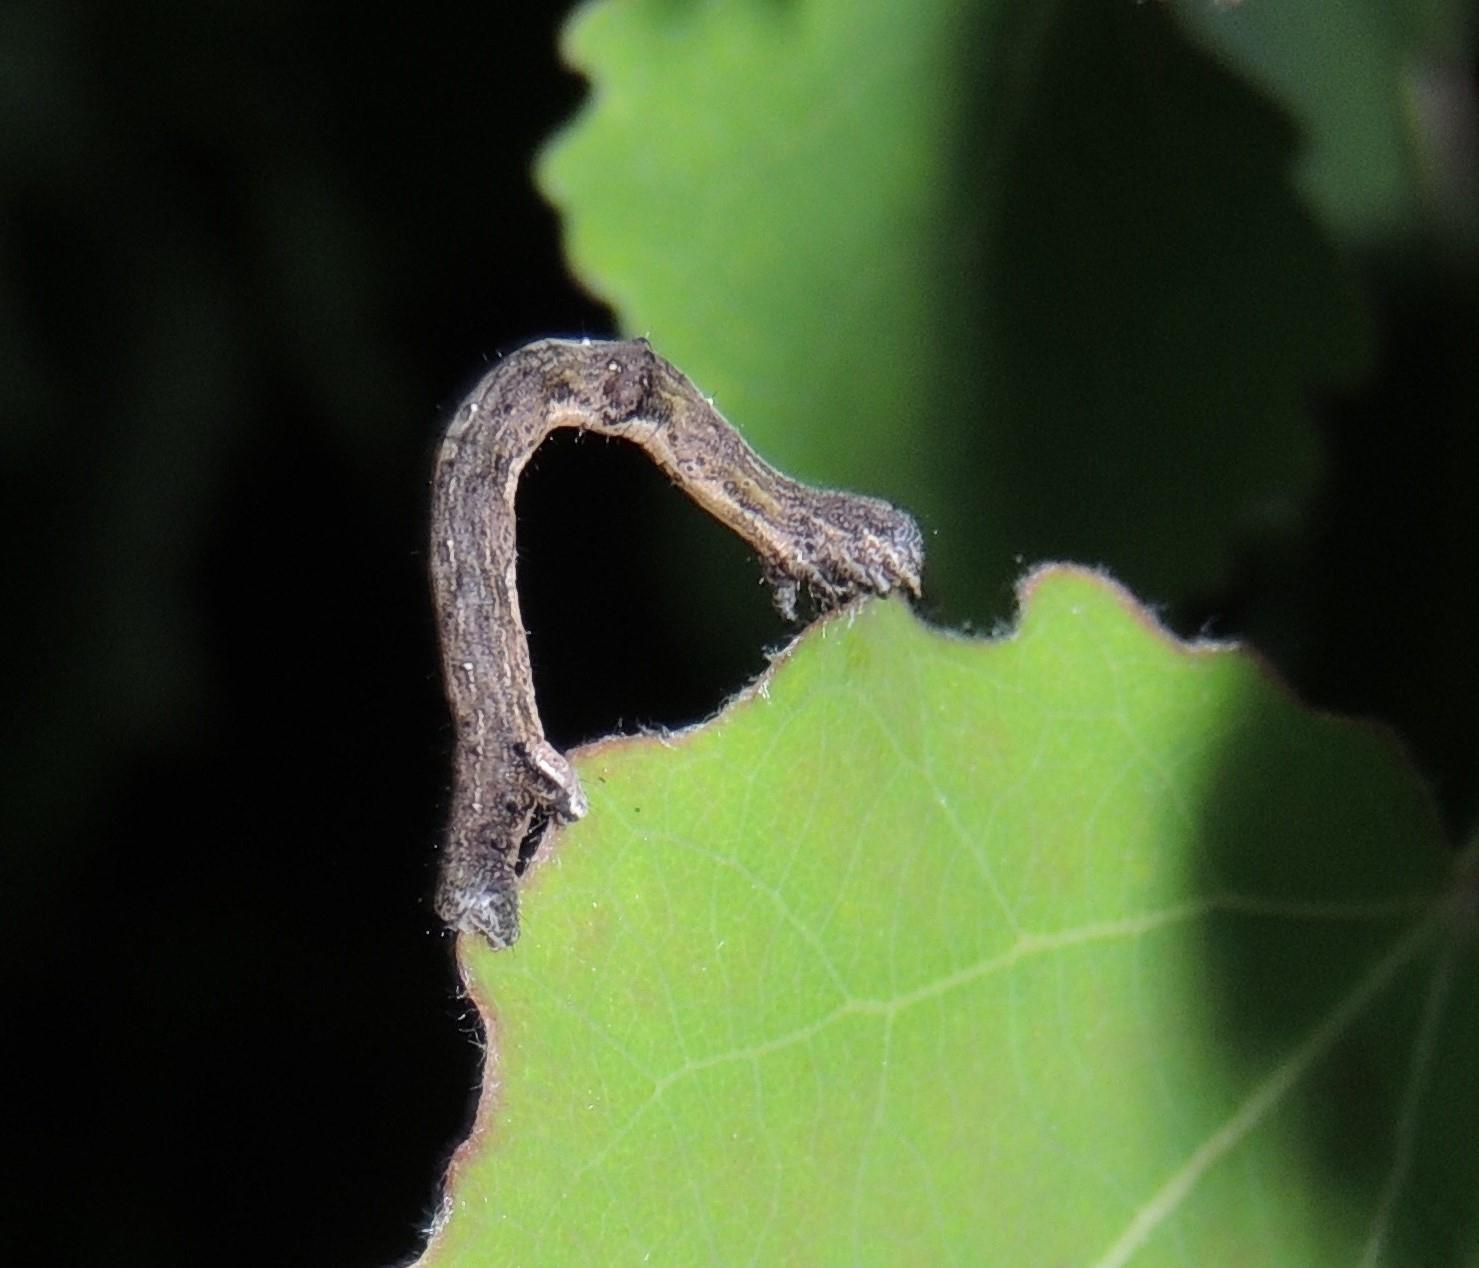 Skråbåndet Spidsmåler (Epione repandaria)